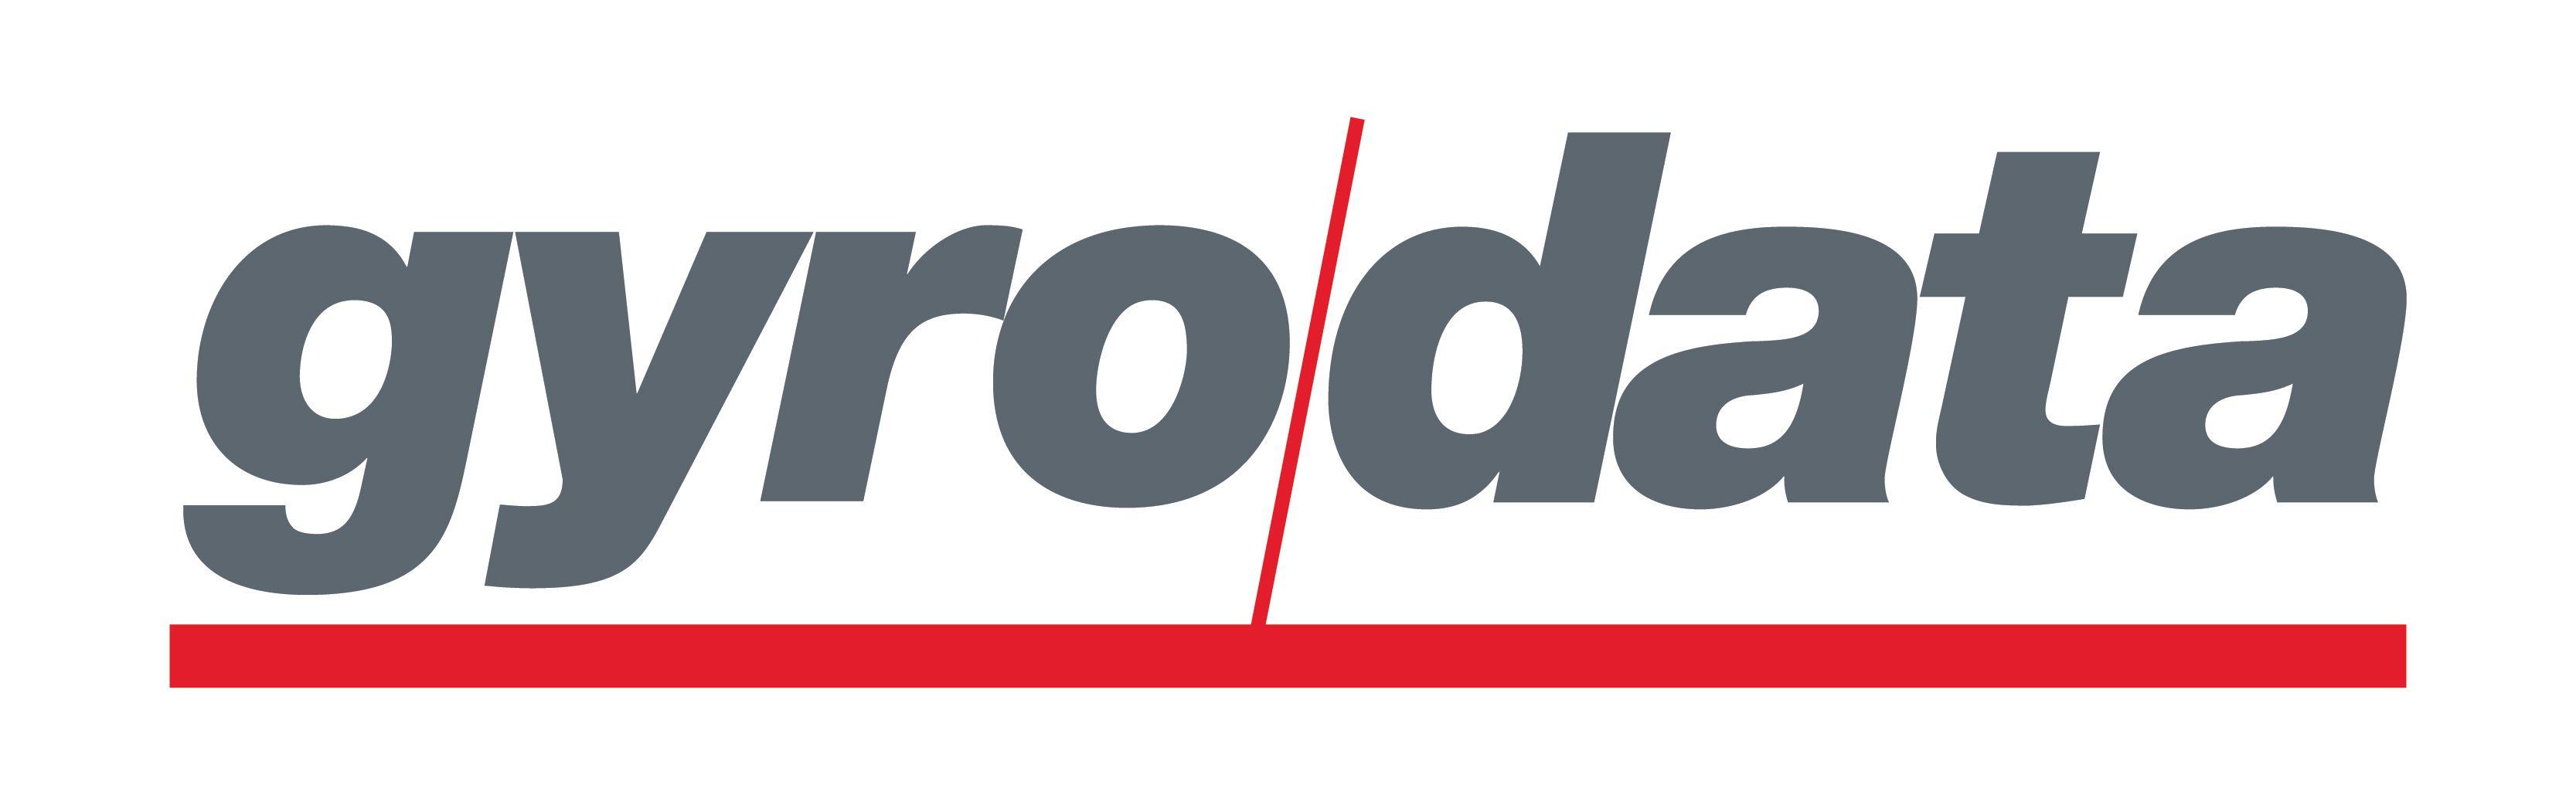 Gyrodata